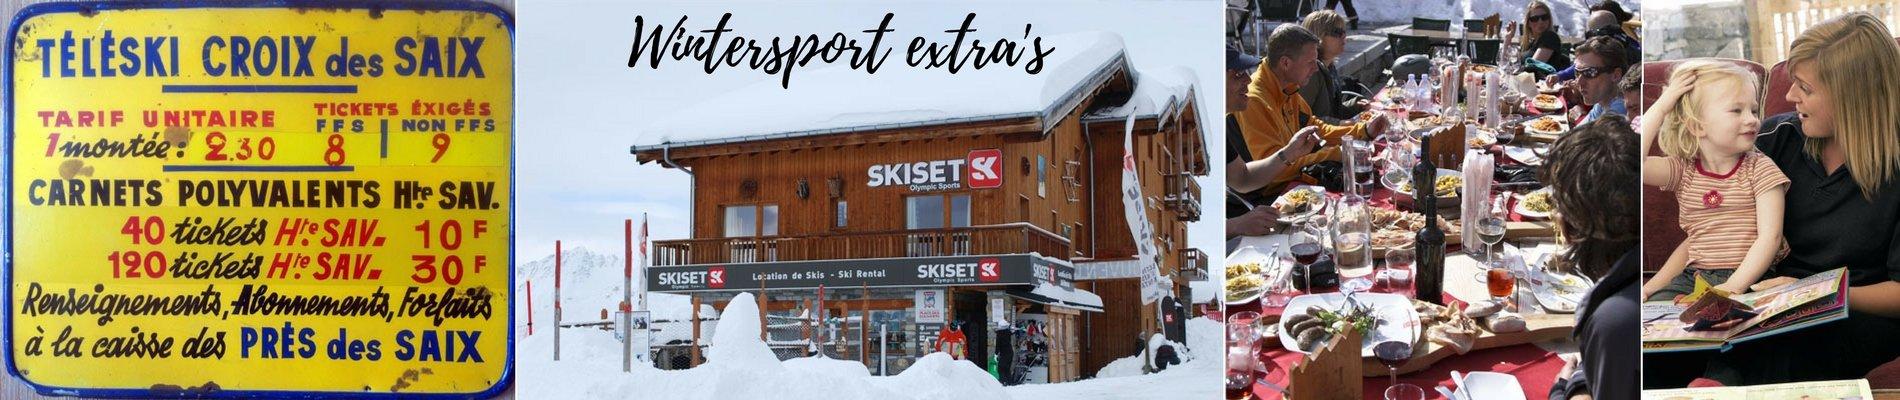 wintersport extra's.jpg